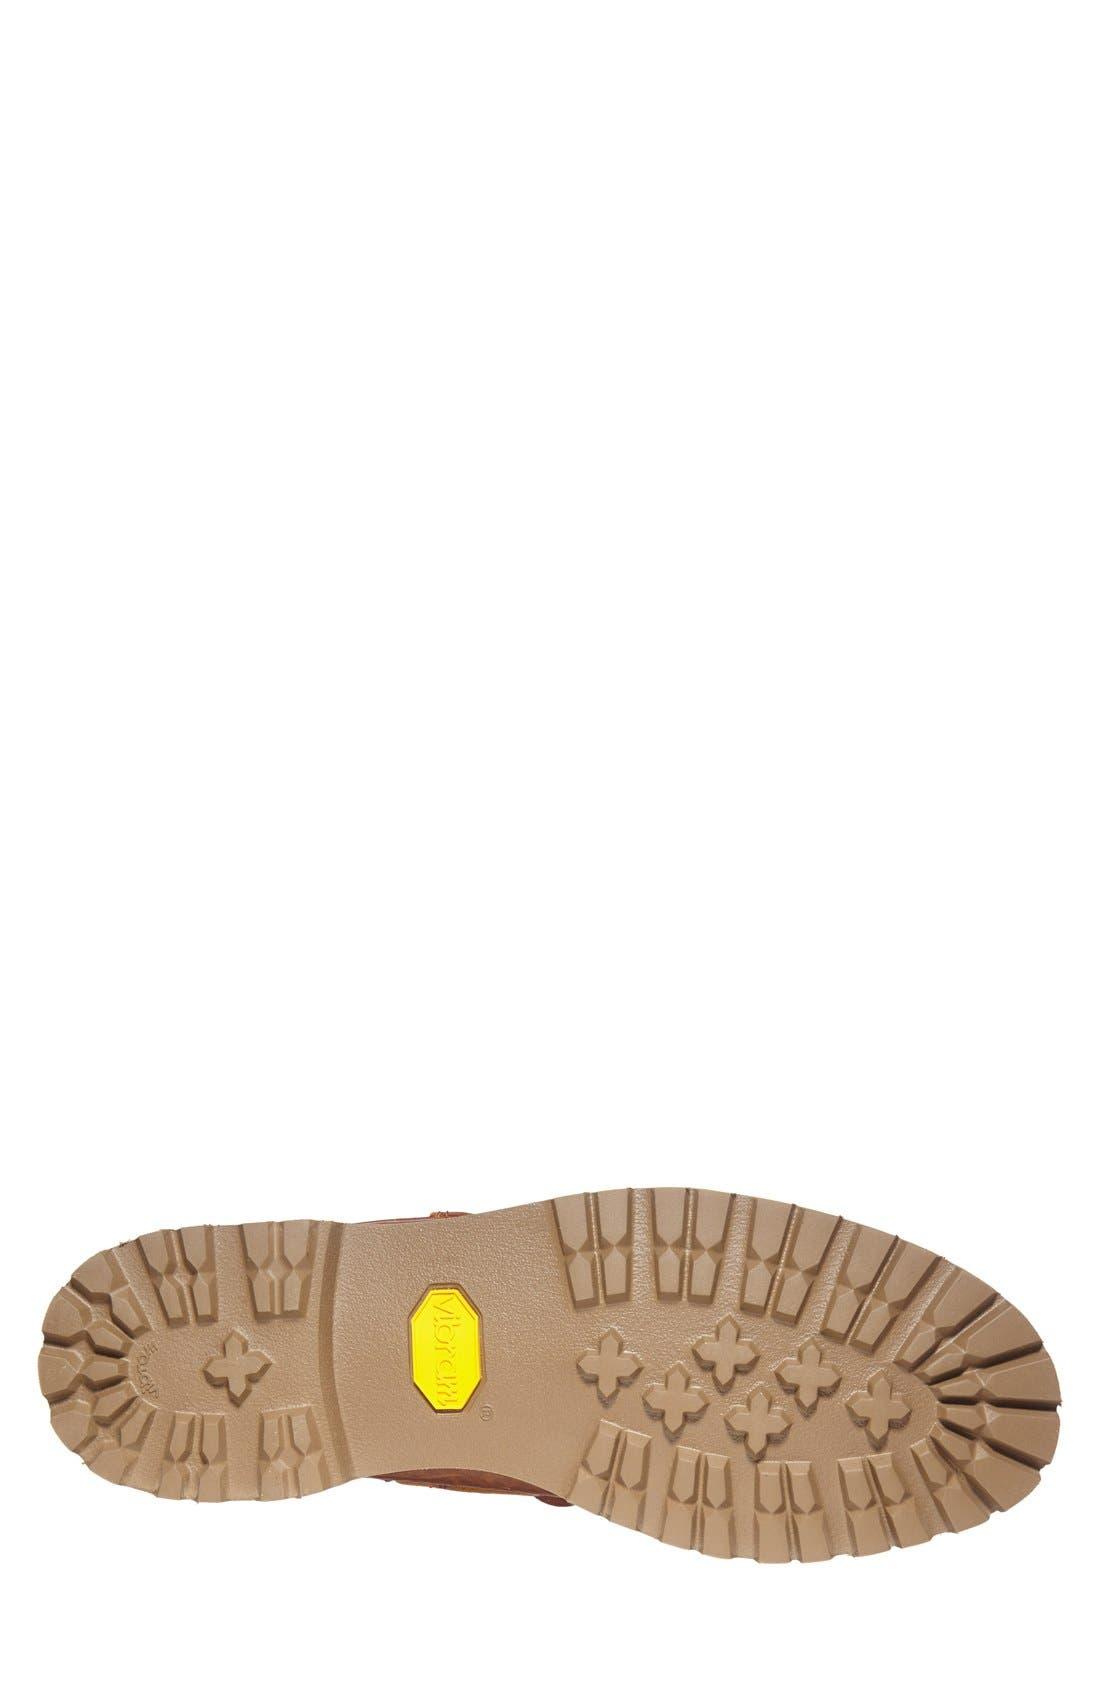 'Custer' Boat Shoe,                             Alternate thumbnail 3, color,                             Whiskey